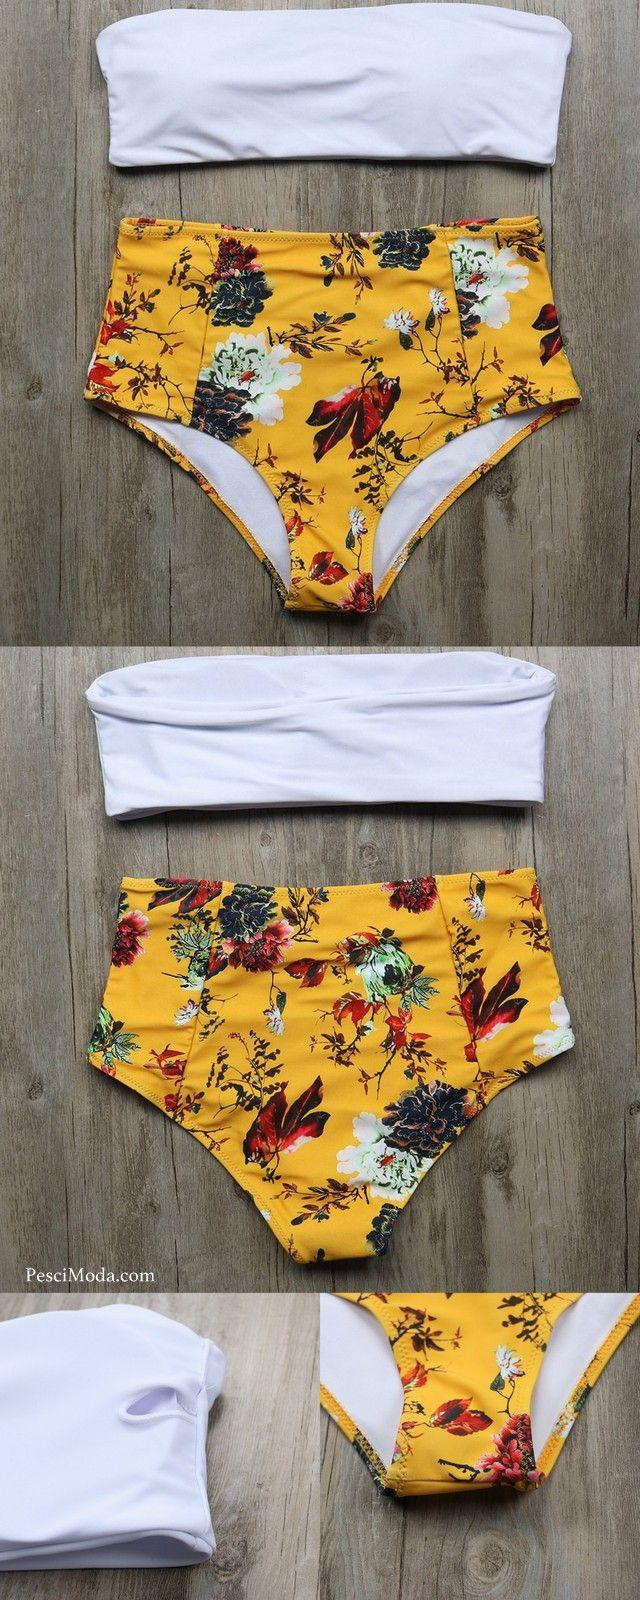 fb0c57da0e 60%OFF Women's Yellow Floral High Waisted Bikini Swimsuits plus  #FREESHIPPING #TwoPieceSwimSet #TwoPieceSwimsuit #TwoPieceOutfit  #TwoPieceSwimwear ...